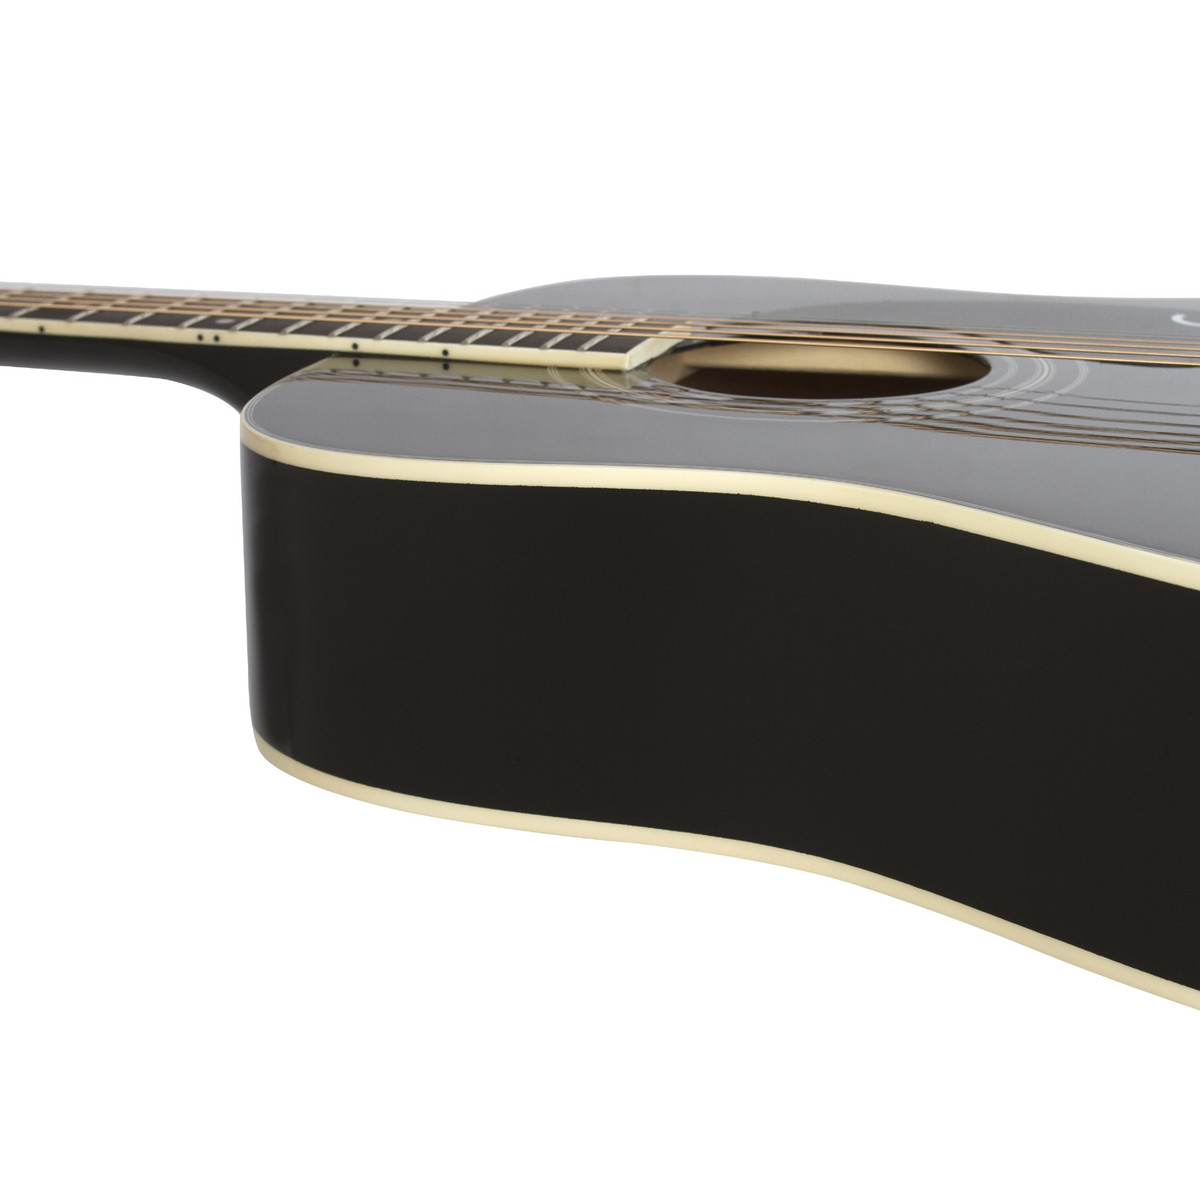 epiphone pro 1 plus acoustic black at gear4music. Black Bedroom Furniture Sets. Home Design Ideas